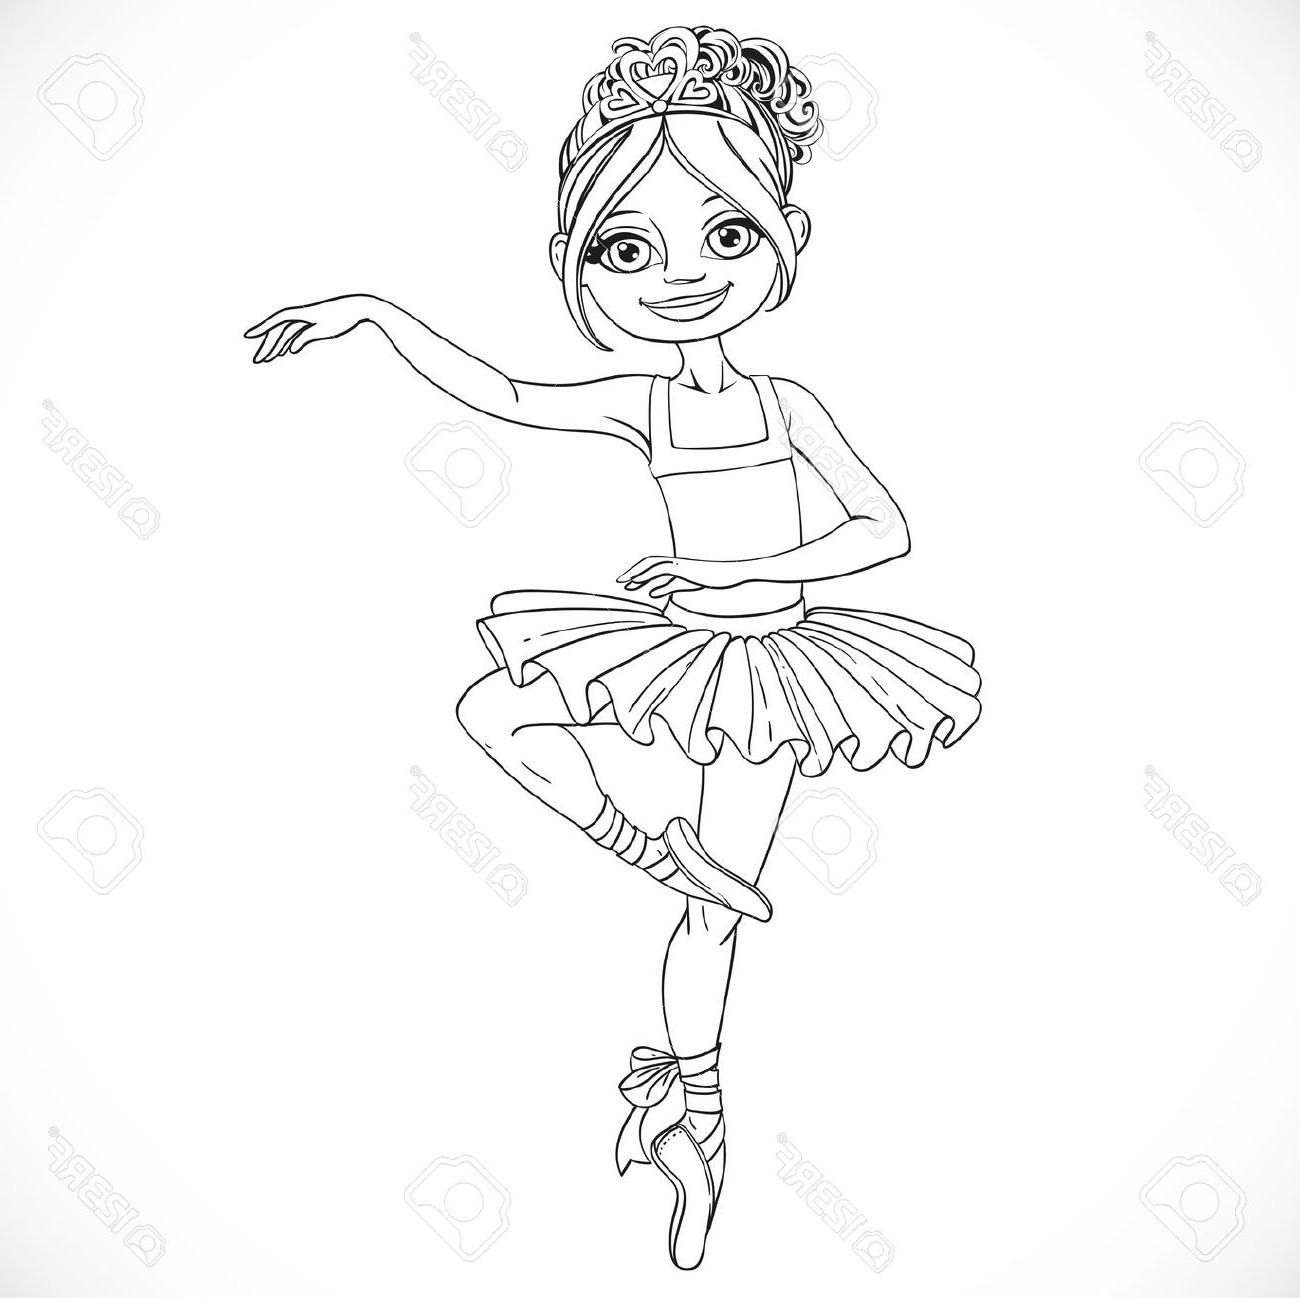 Ballerina clipart black and white. Best of dancing letter